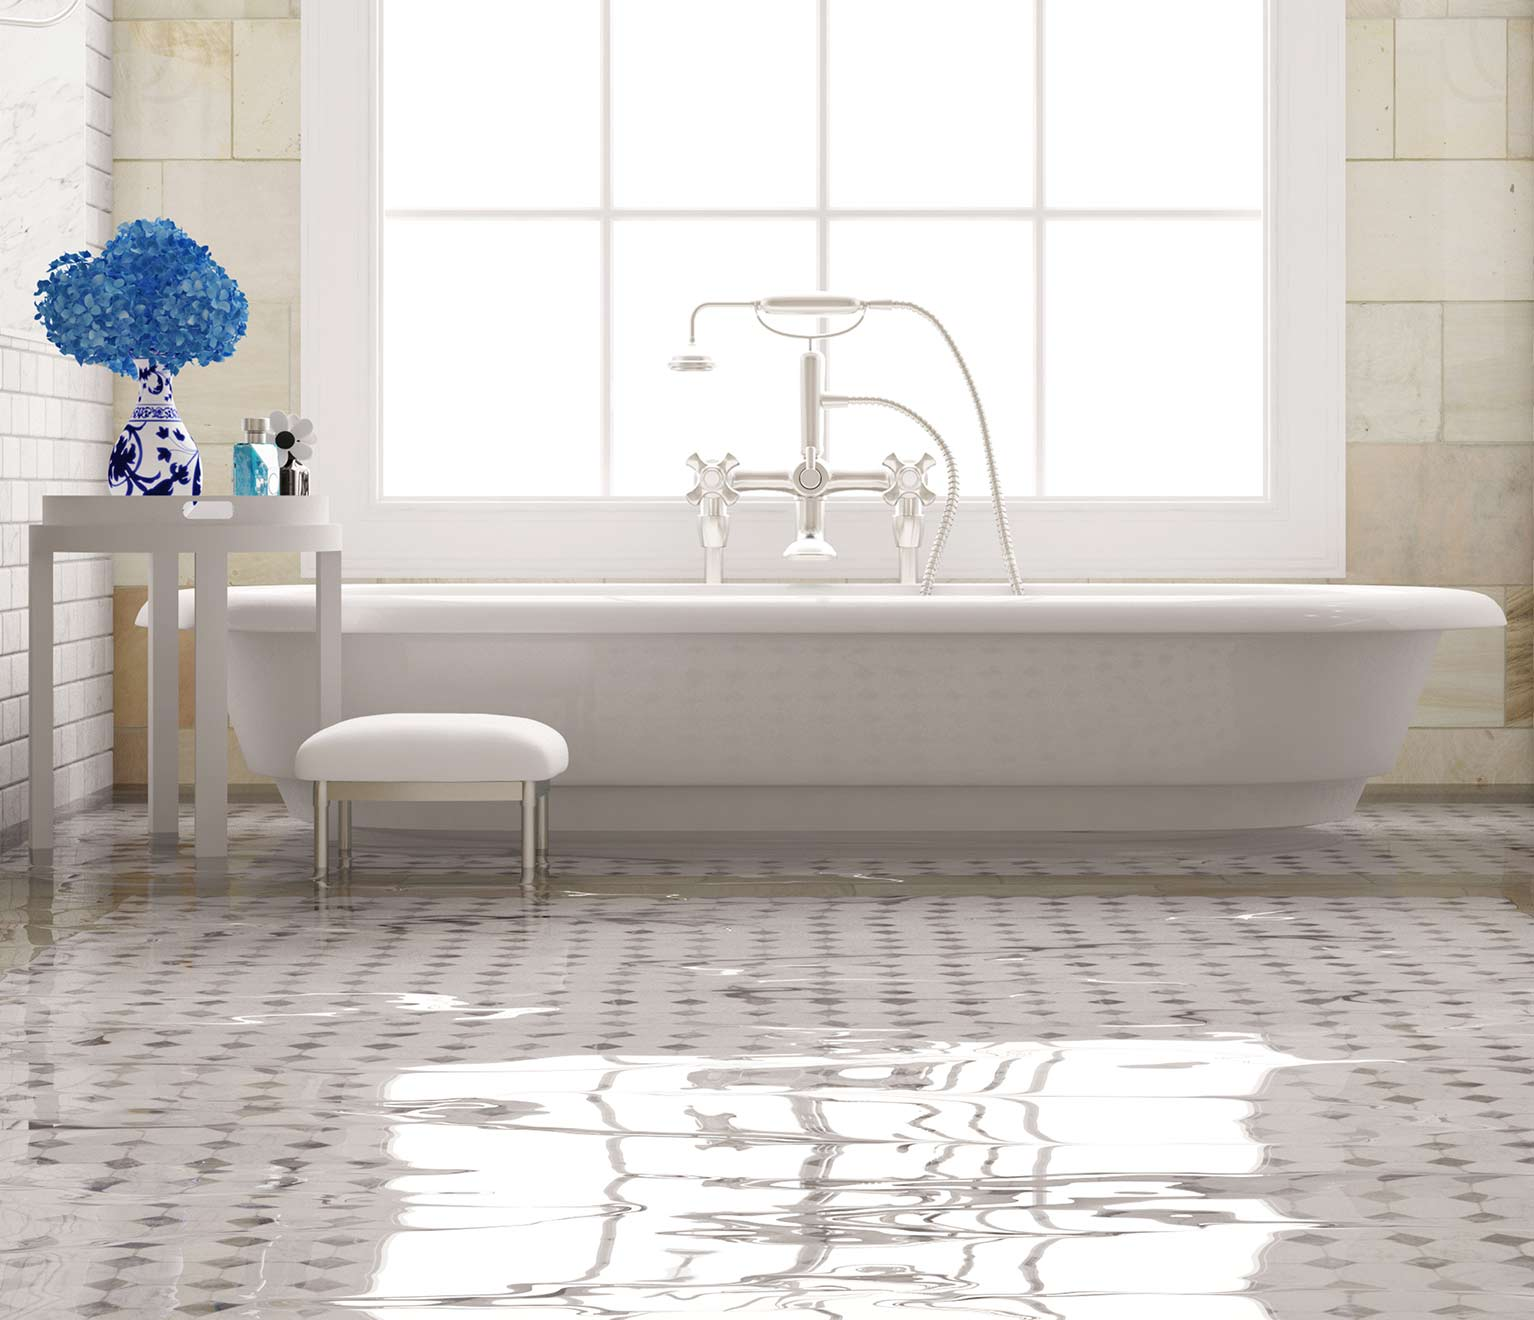 flooded_bathroom__servpro_of_west_pensacola_1101_s._fairfield_dr_pensacola__fl._32506_850-469-1160_https-::bit.ly:36jv0ta_.jpg